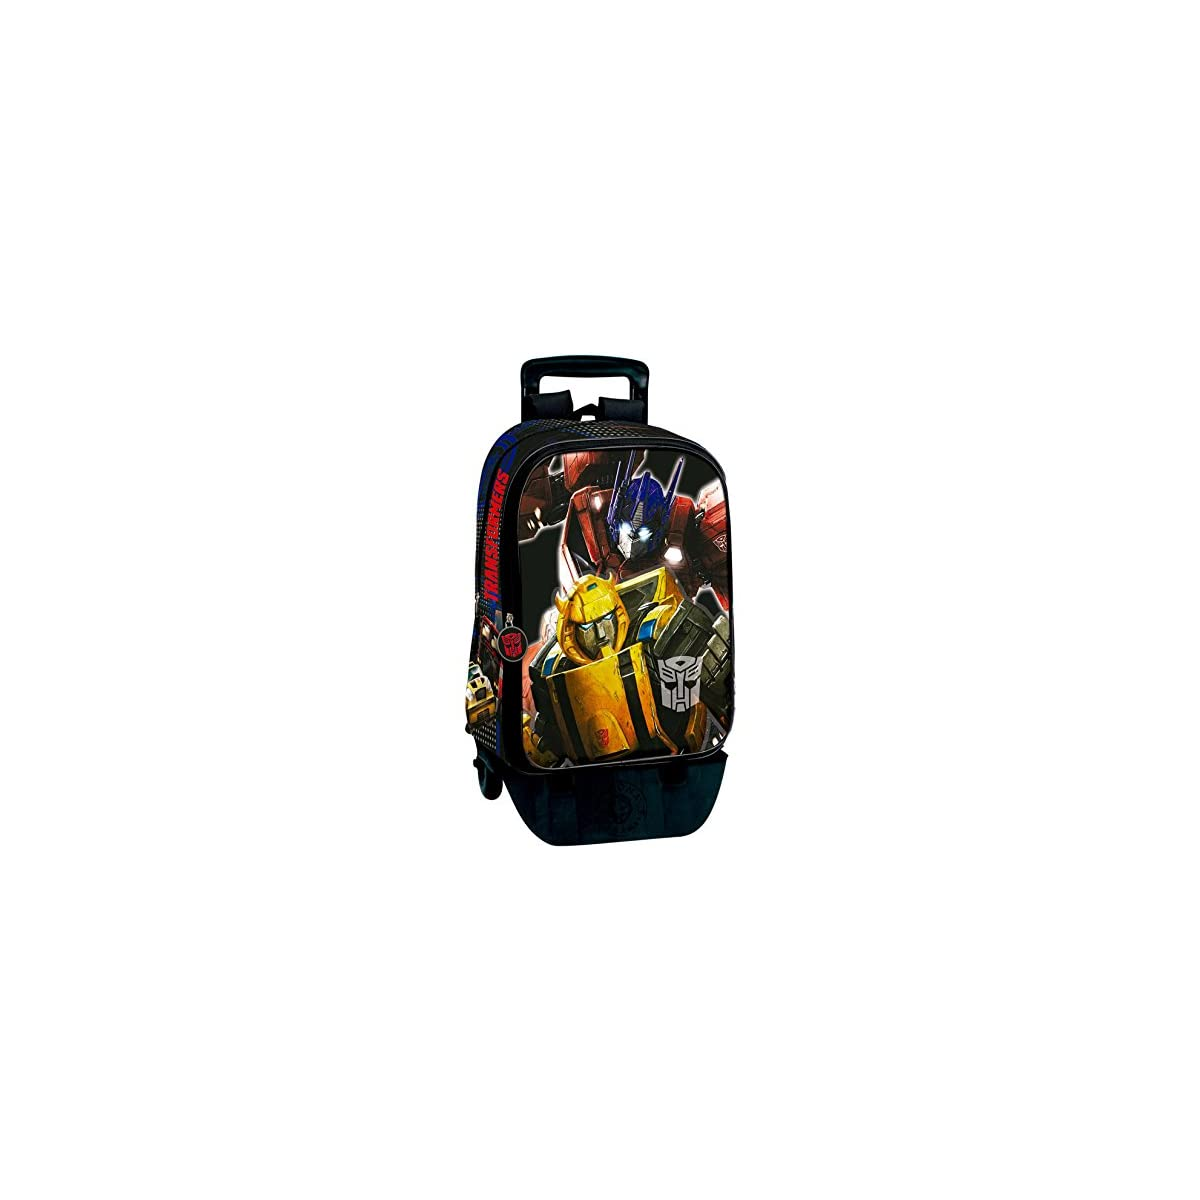 51158QOMPfL. SS1200  - Transformers Mochila con Carro Plegable, Ruedas, Trolley